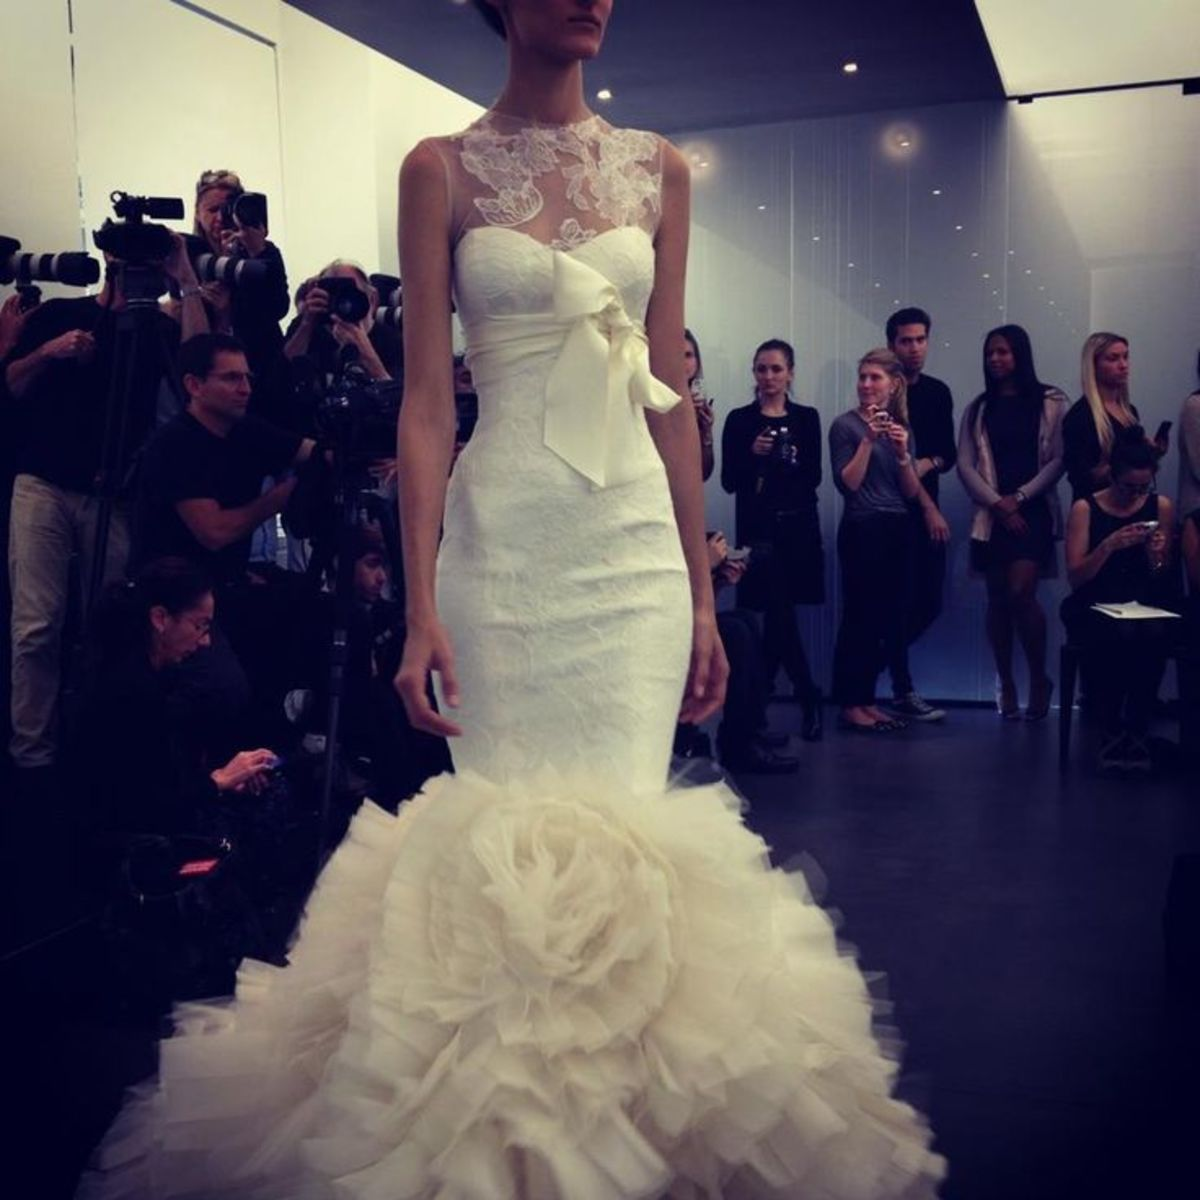 Mermaid wedding dress for Fall 2013 from NYC Bridal Fashion Week made by Vera Wang